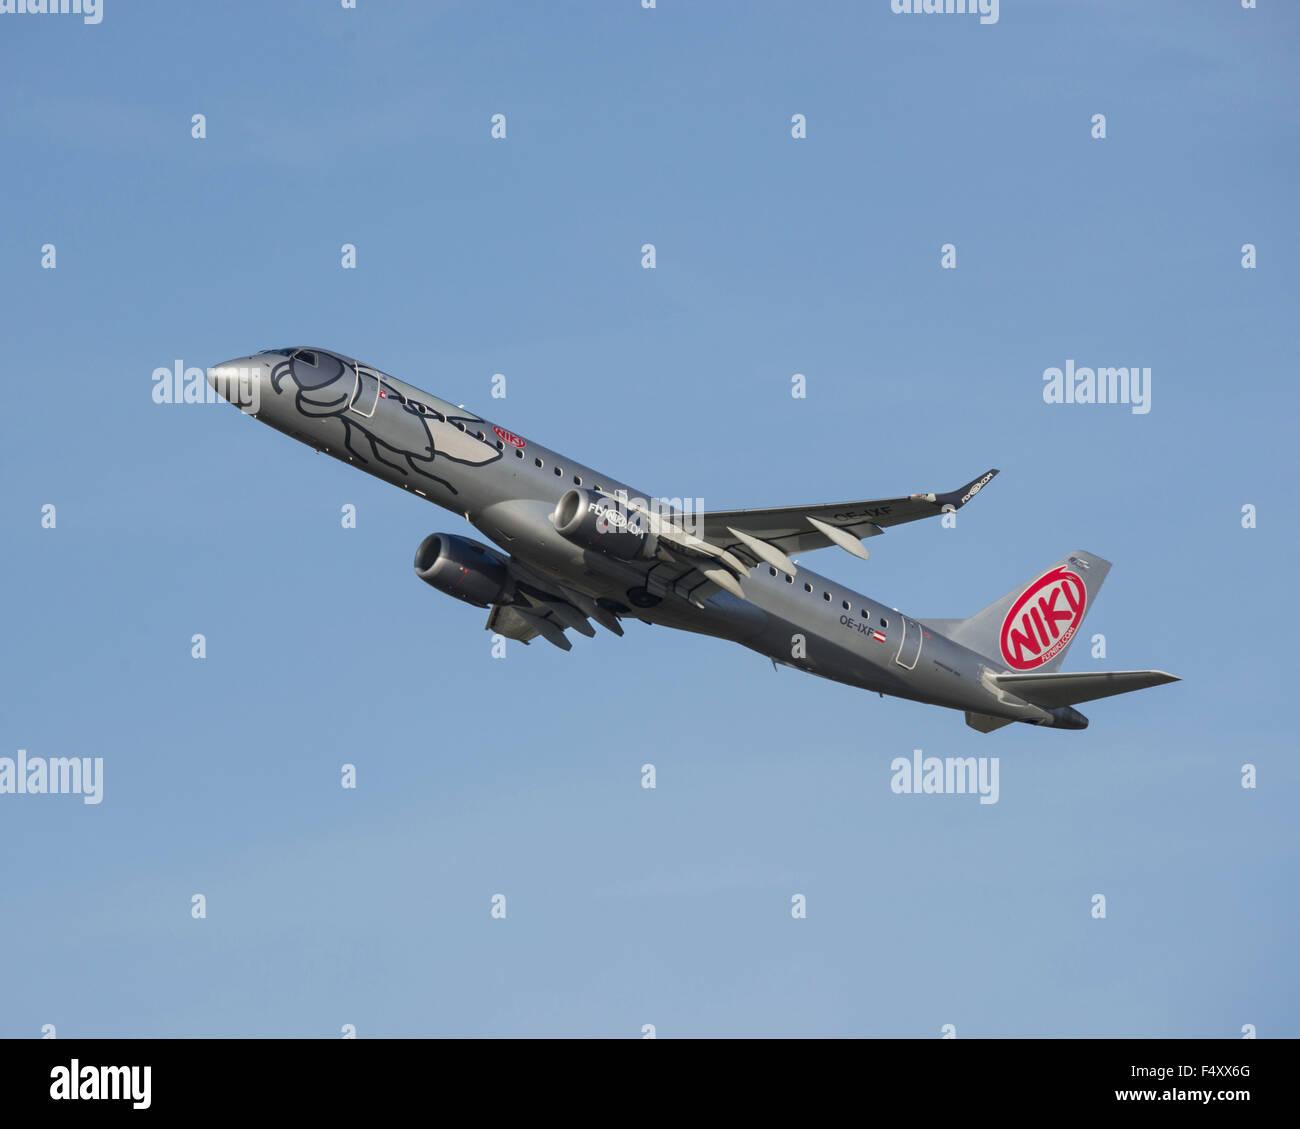 Embraer ERJ-190-100LR, NIKI Luftfahrt GmbH, climbing - Stock Image